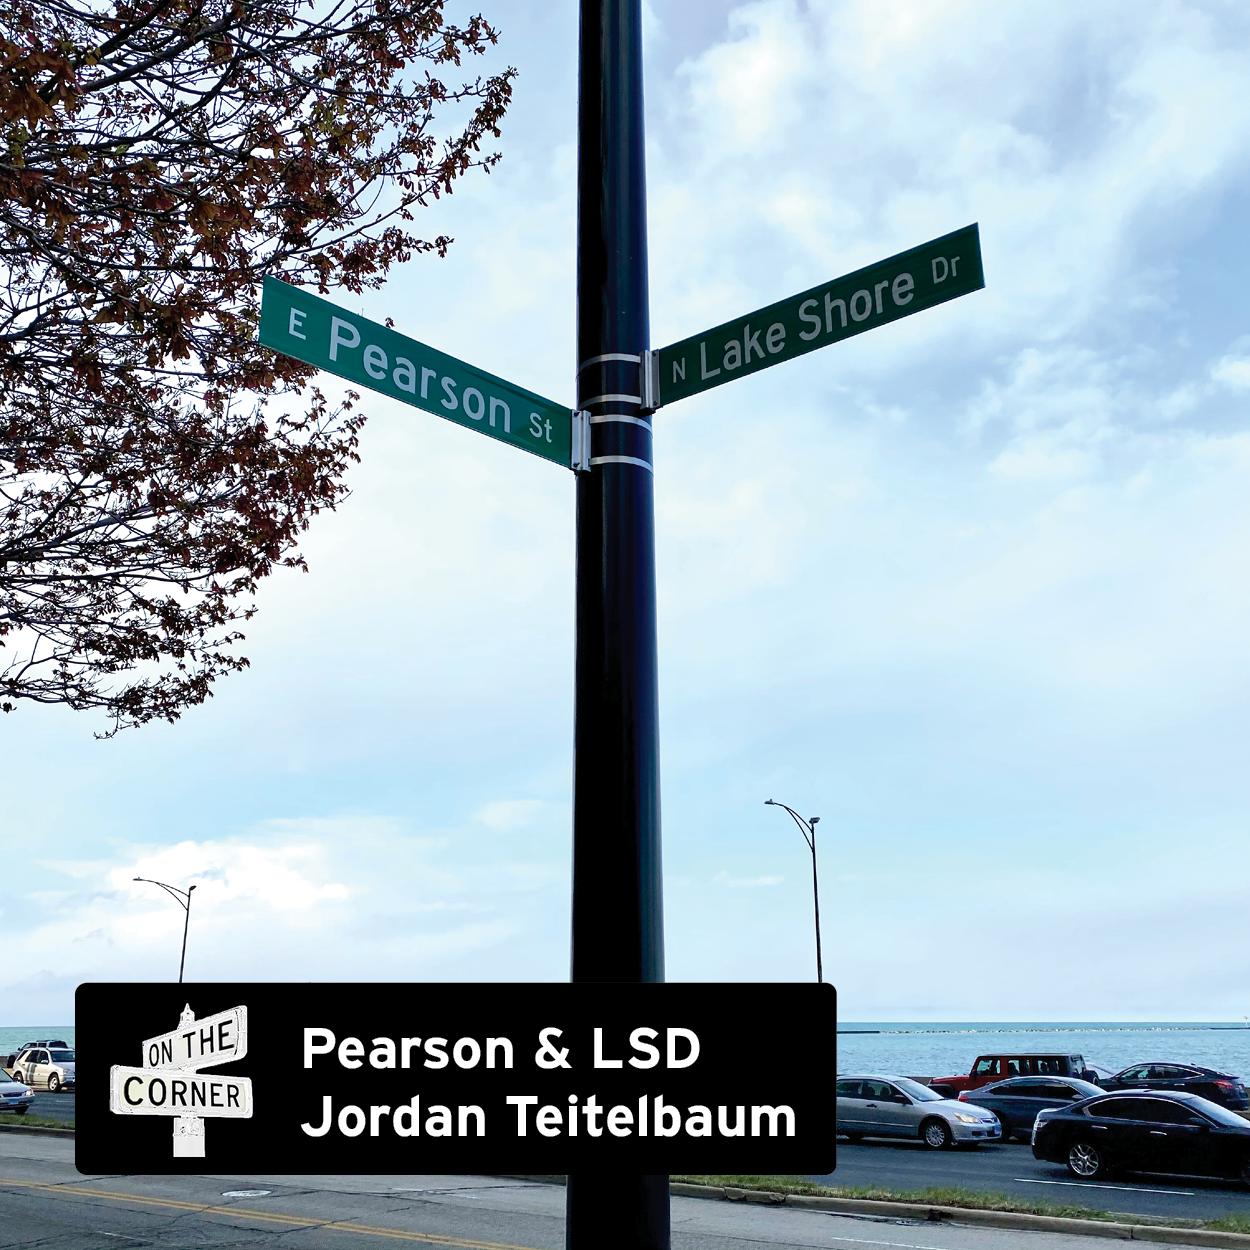 Pearson & LSD Teitelbaum (Square)